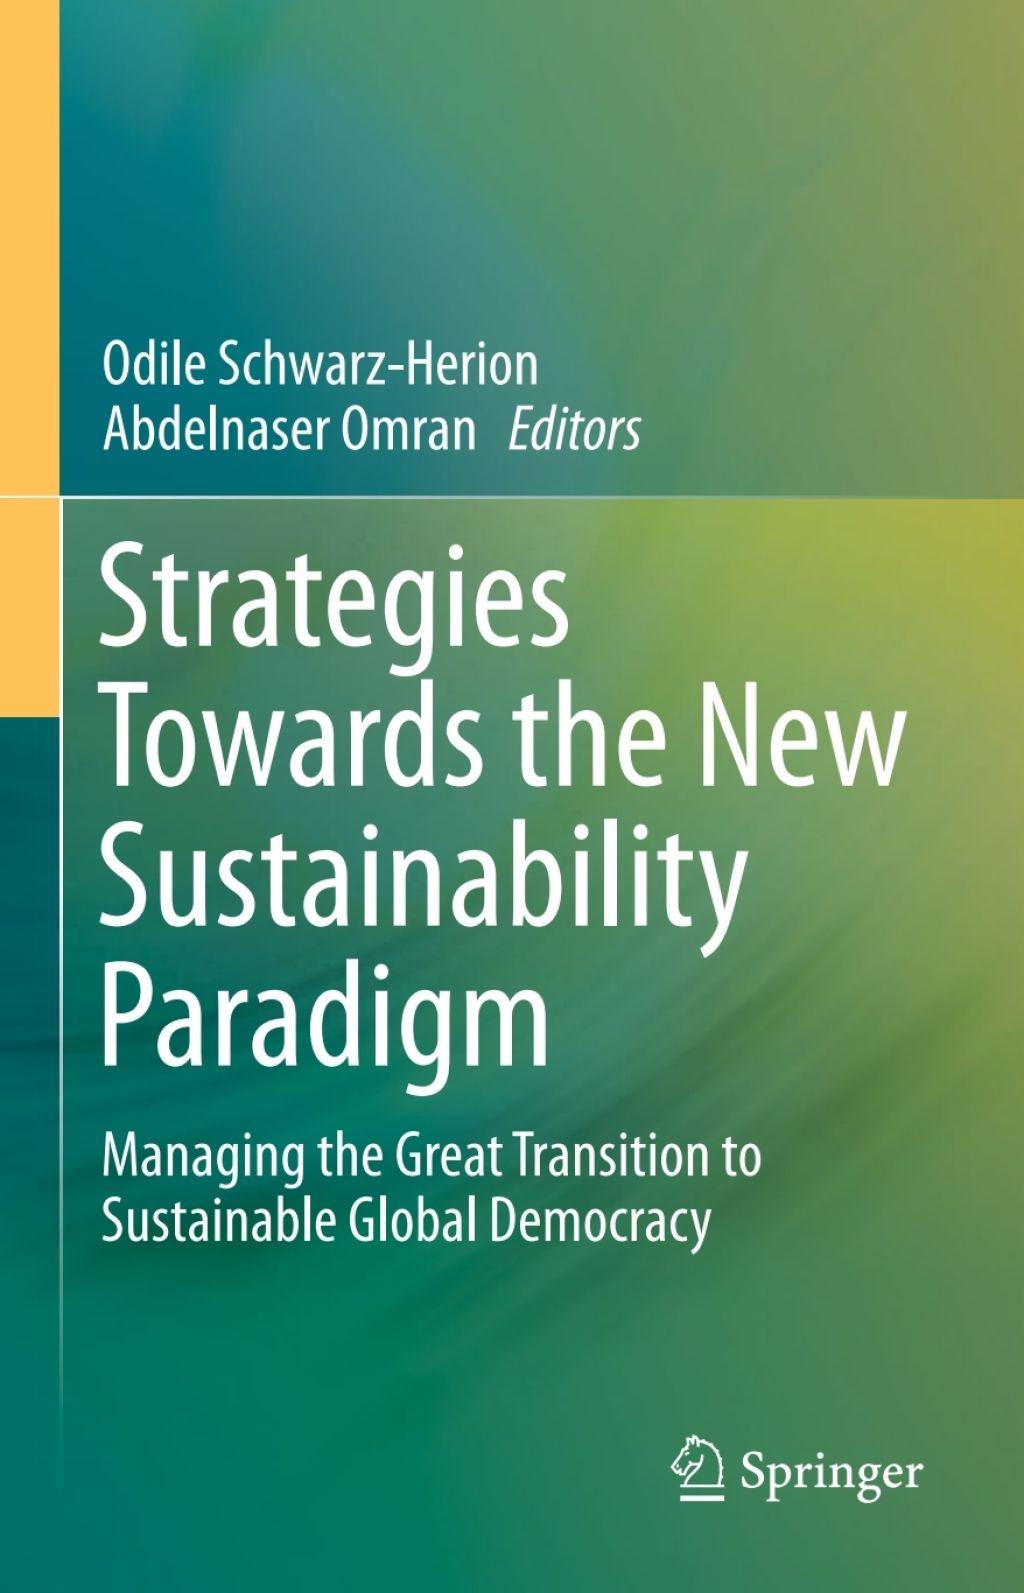 Strategies Towards The New Sustainability Paradigm Ebook Paradigm Ebook Strategies